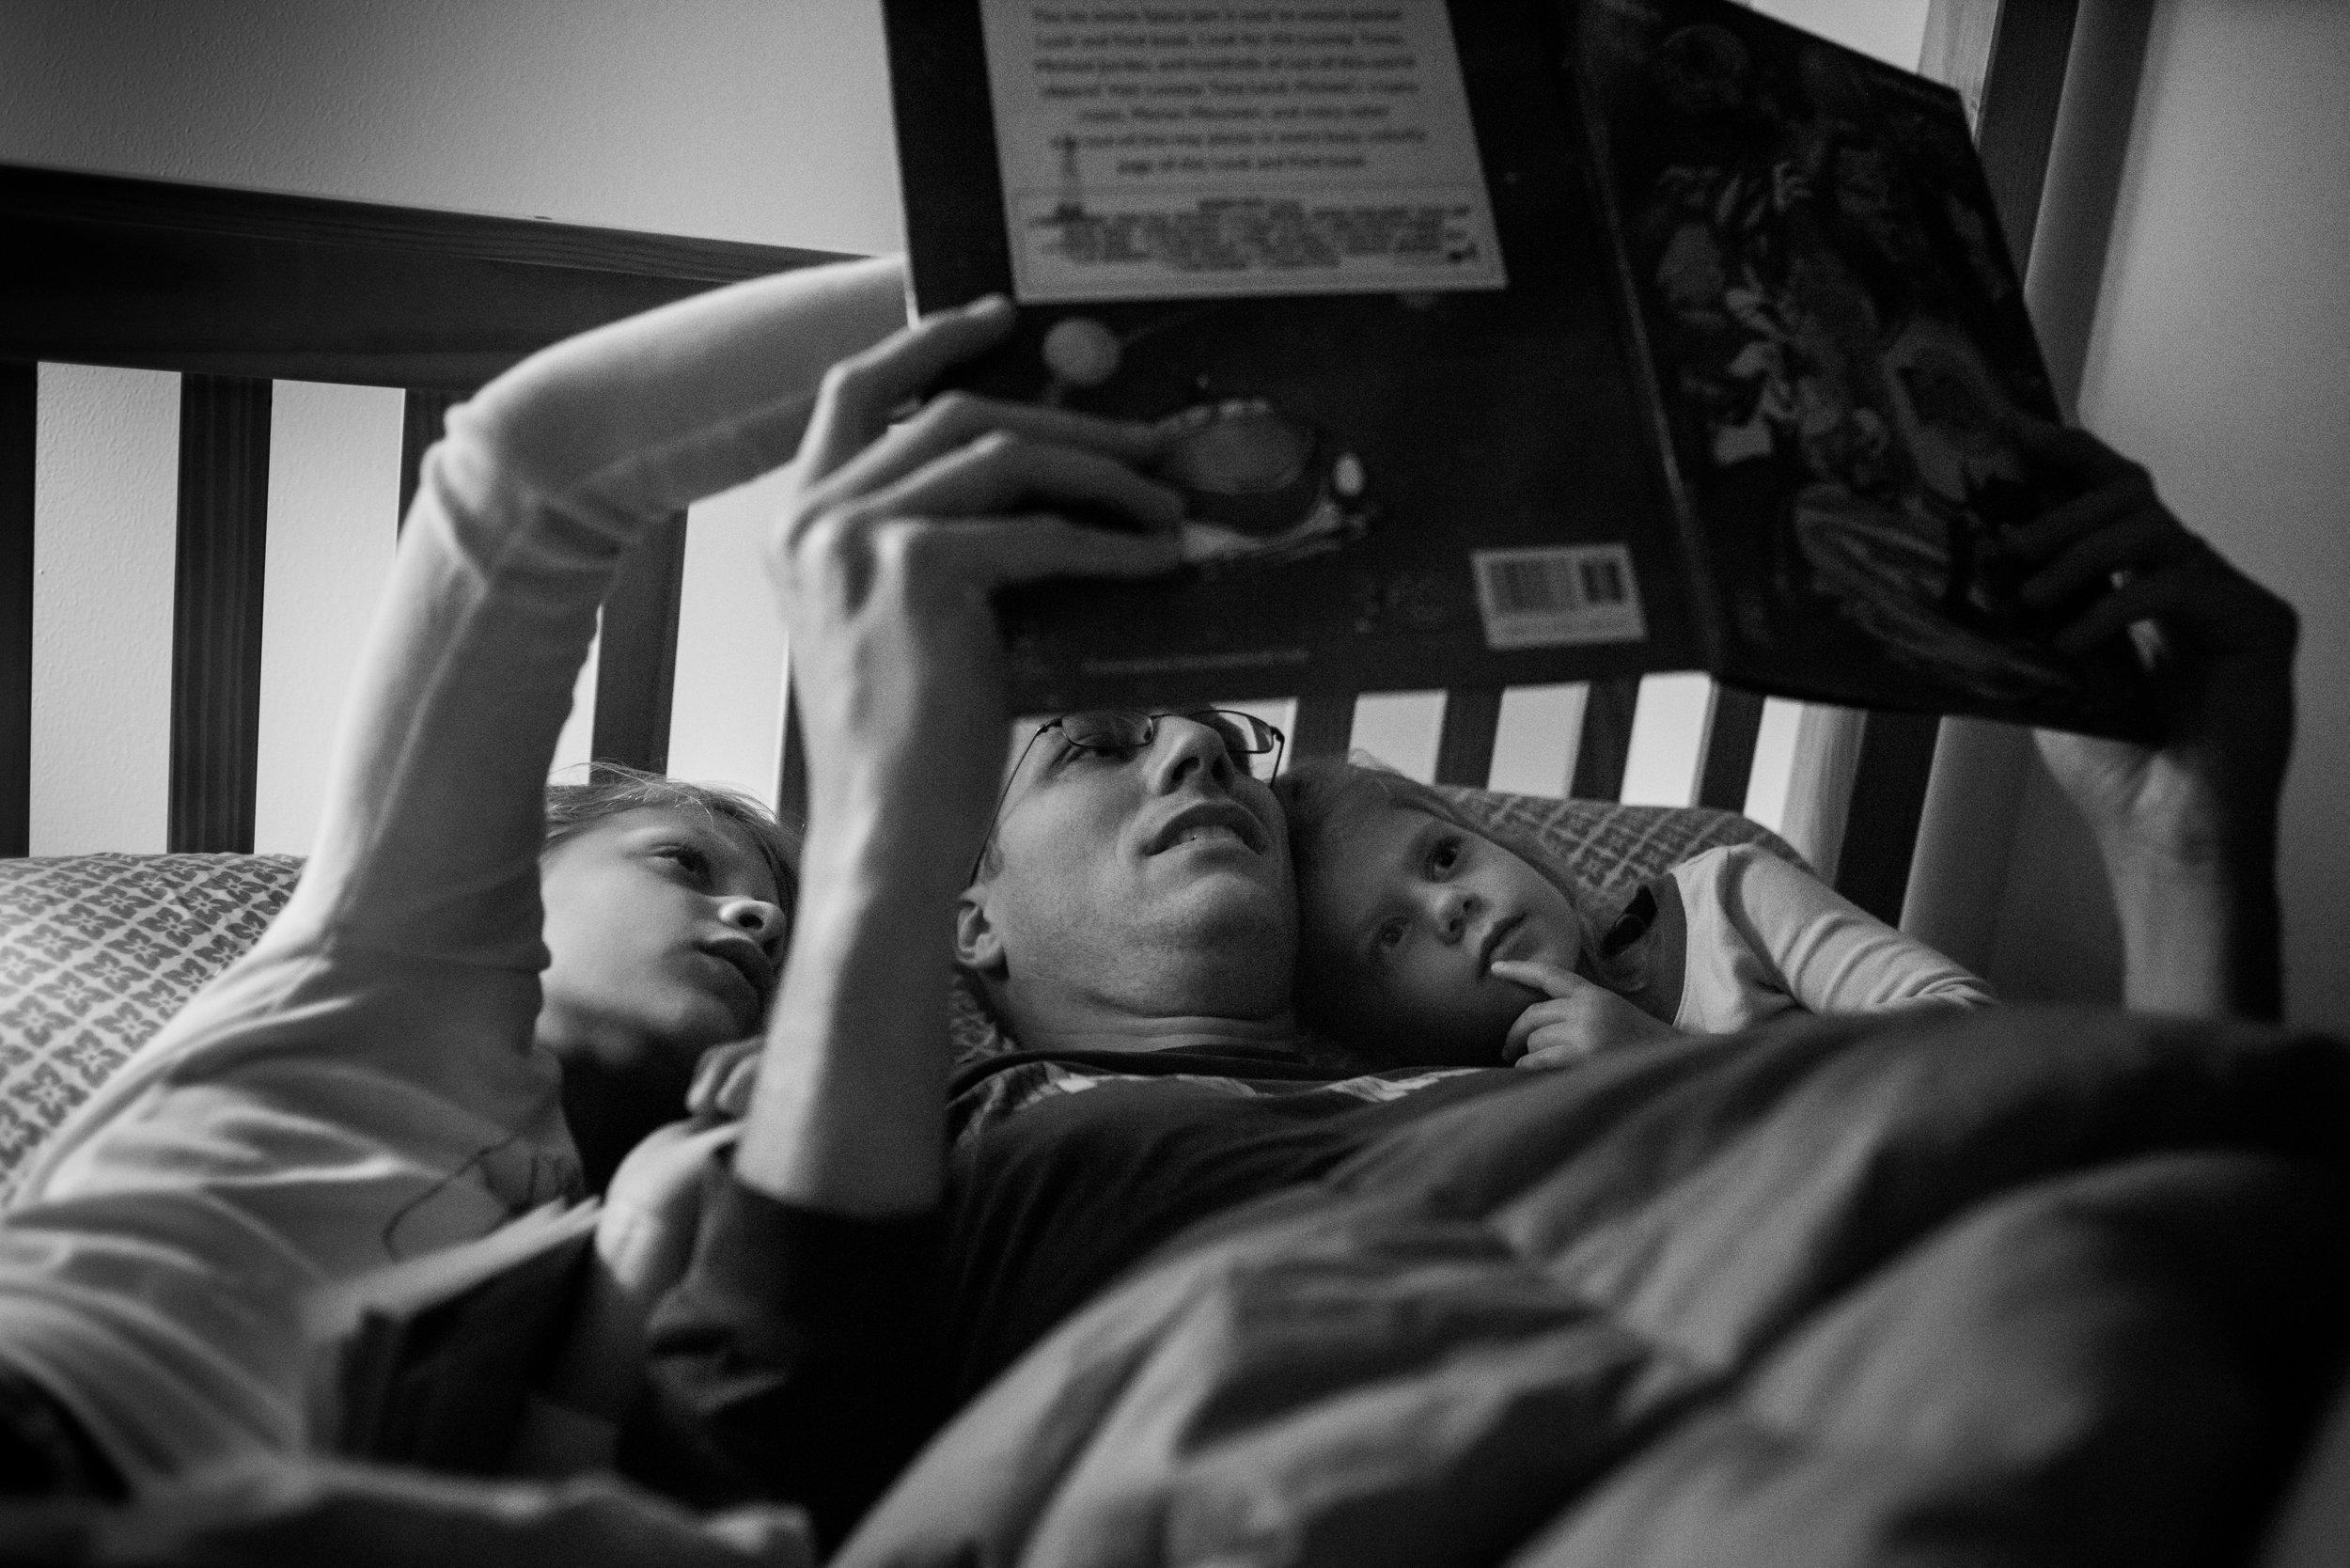 JuliaMatthewsPhotography_MadisonWisconsinFamilyPhotography_Documentary-24.jpg